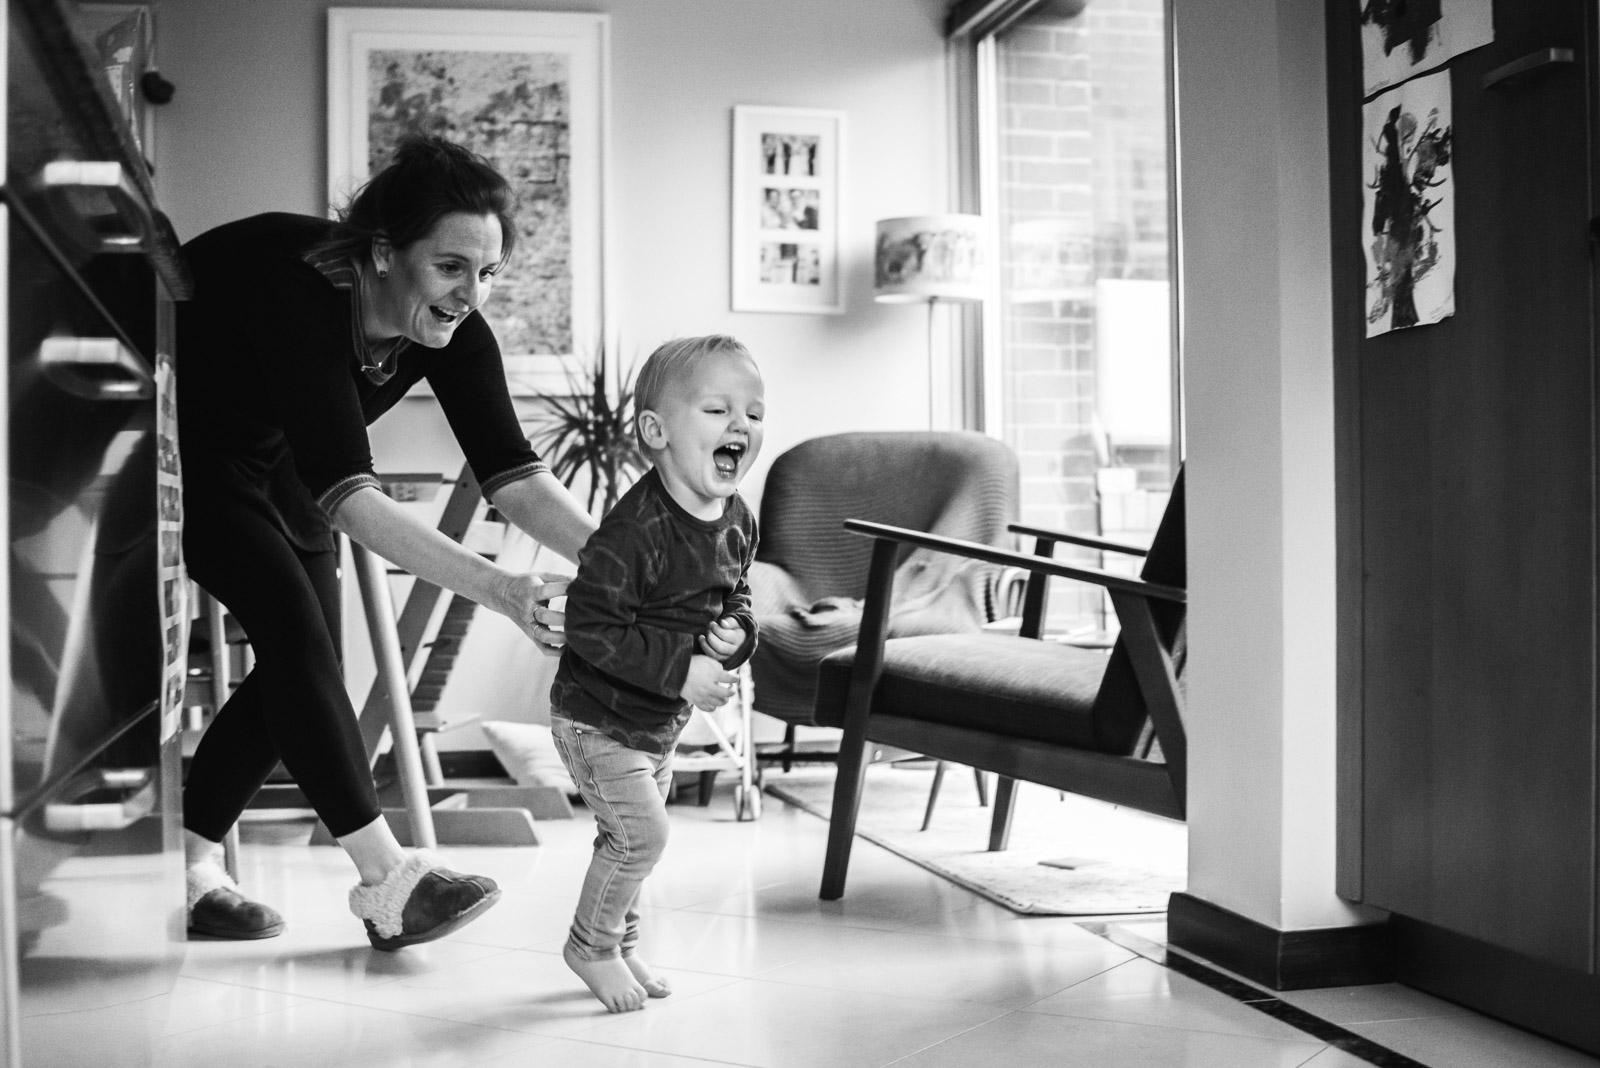 Emotive family photography, Mum chasing boy